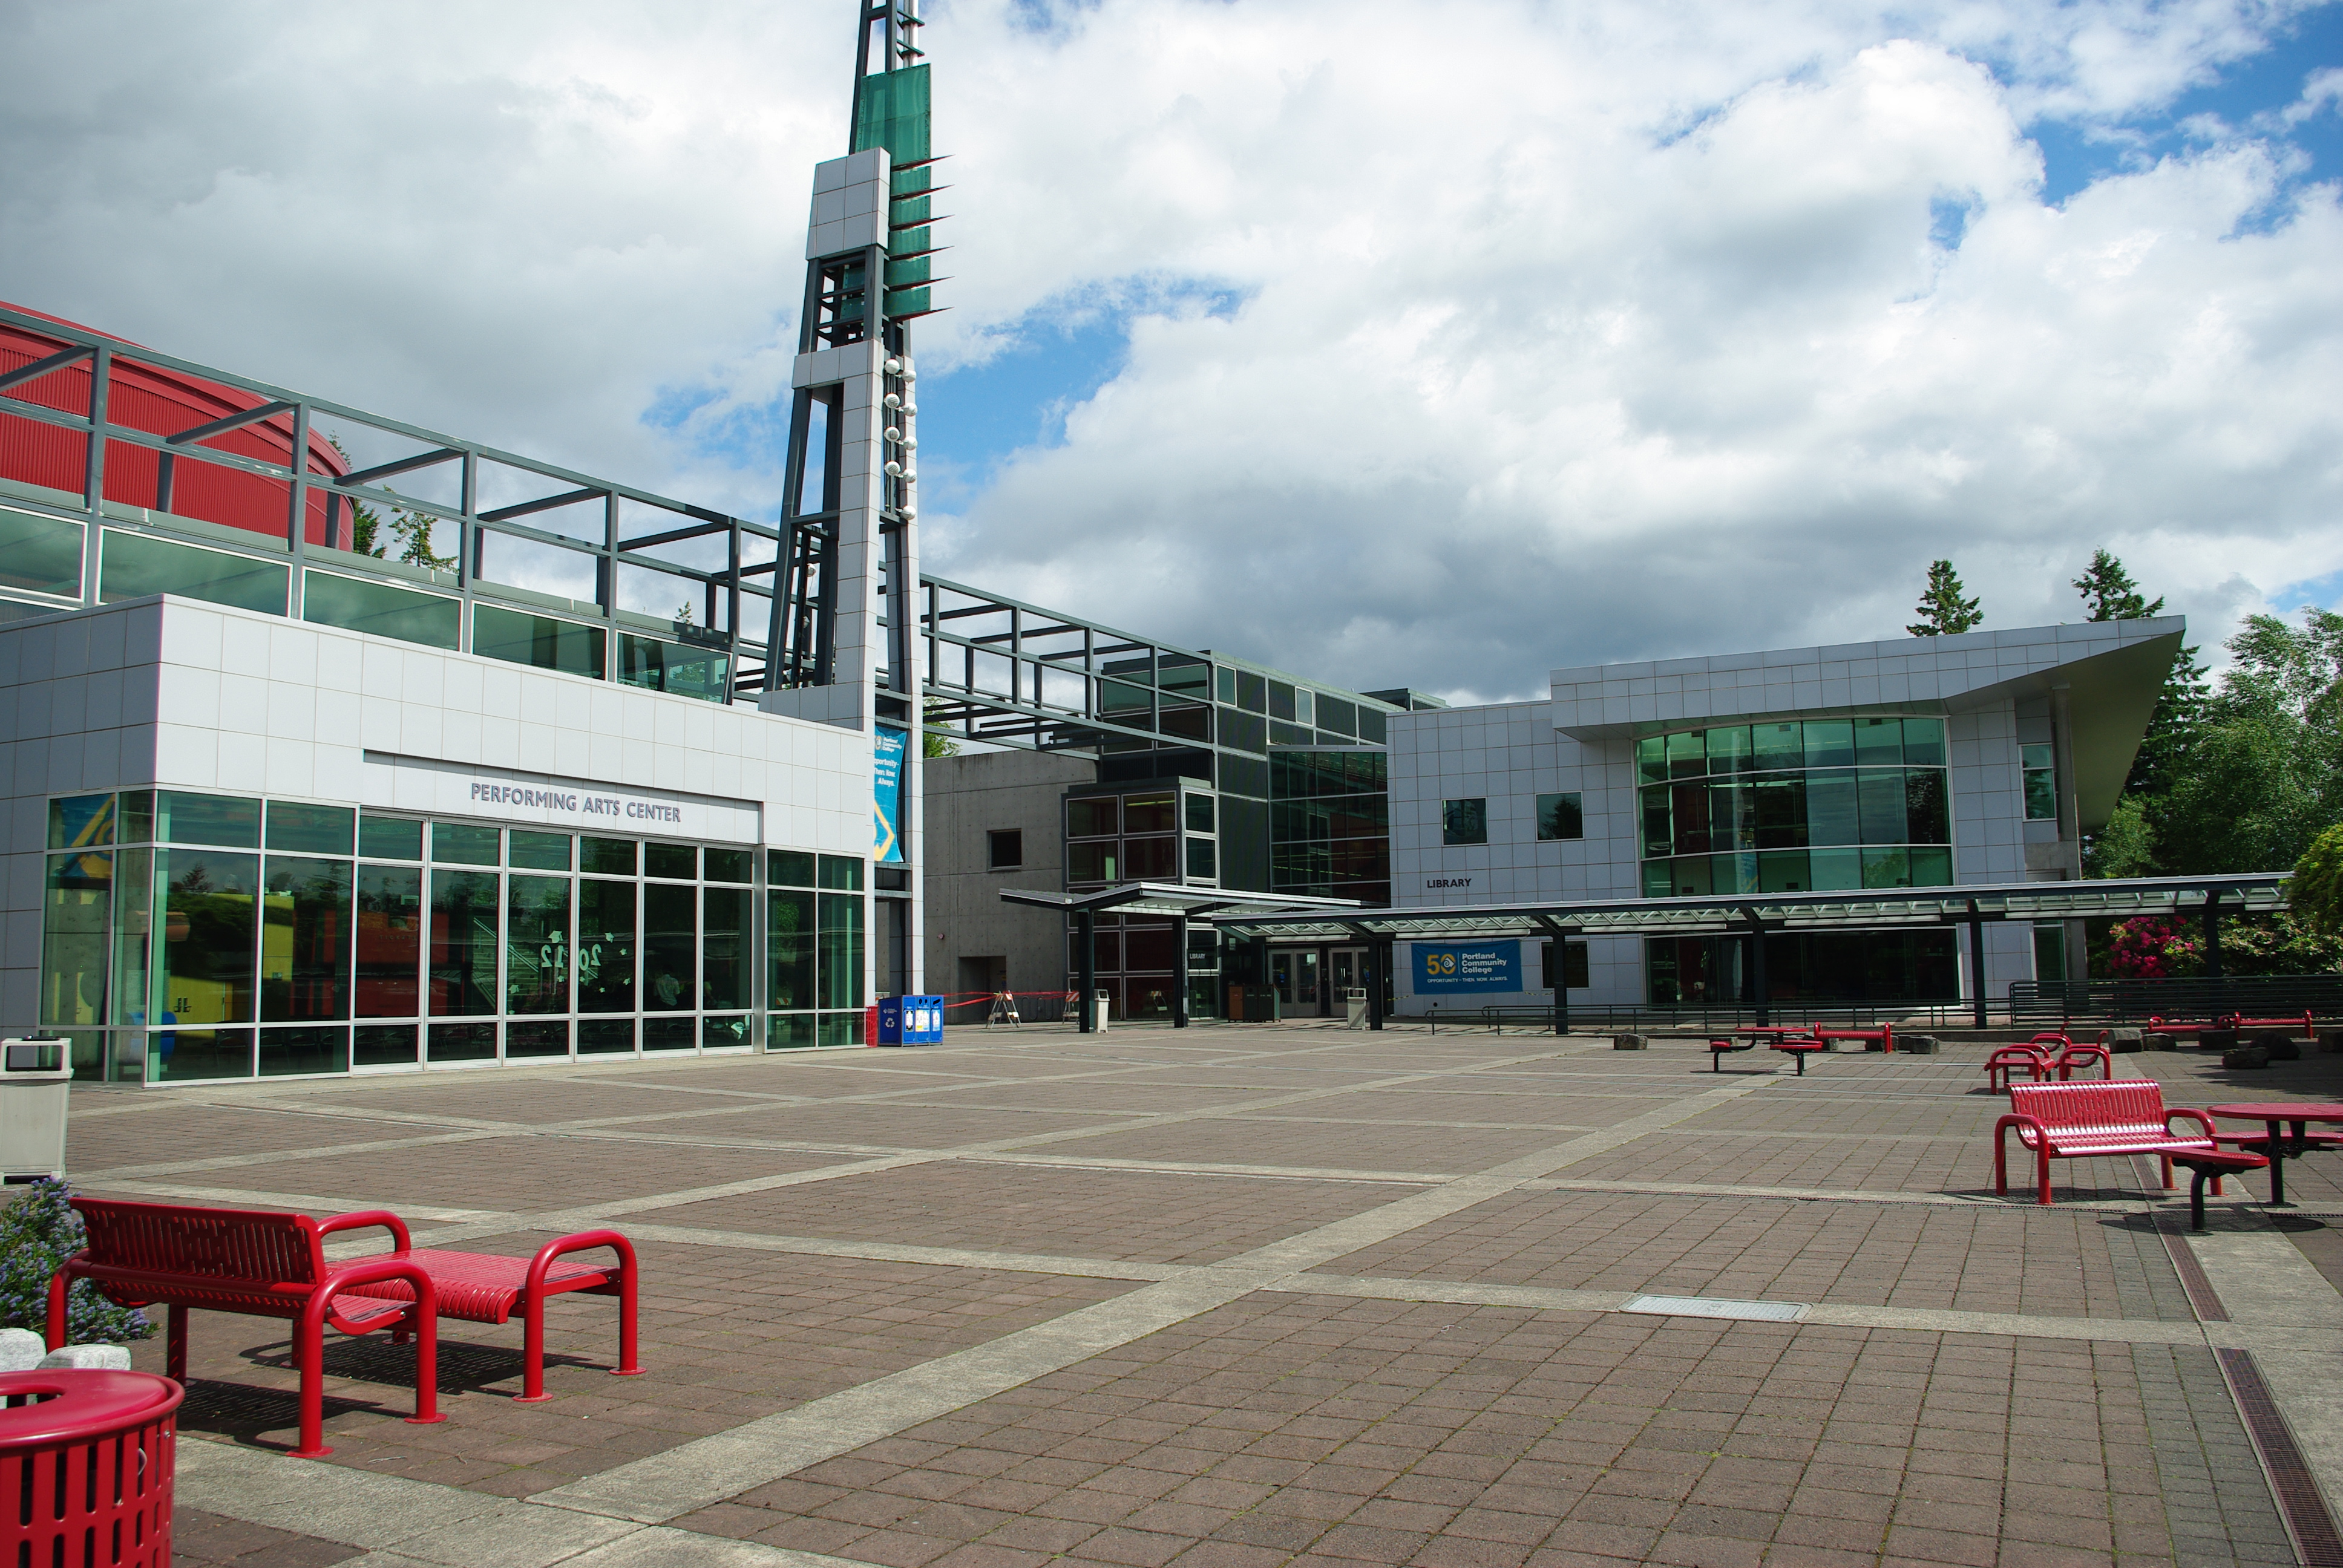 File:Library and arts center at PCC Sylvania - Portland, Oregon.JPG ...